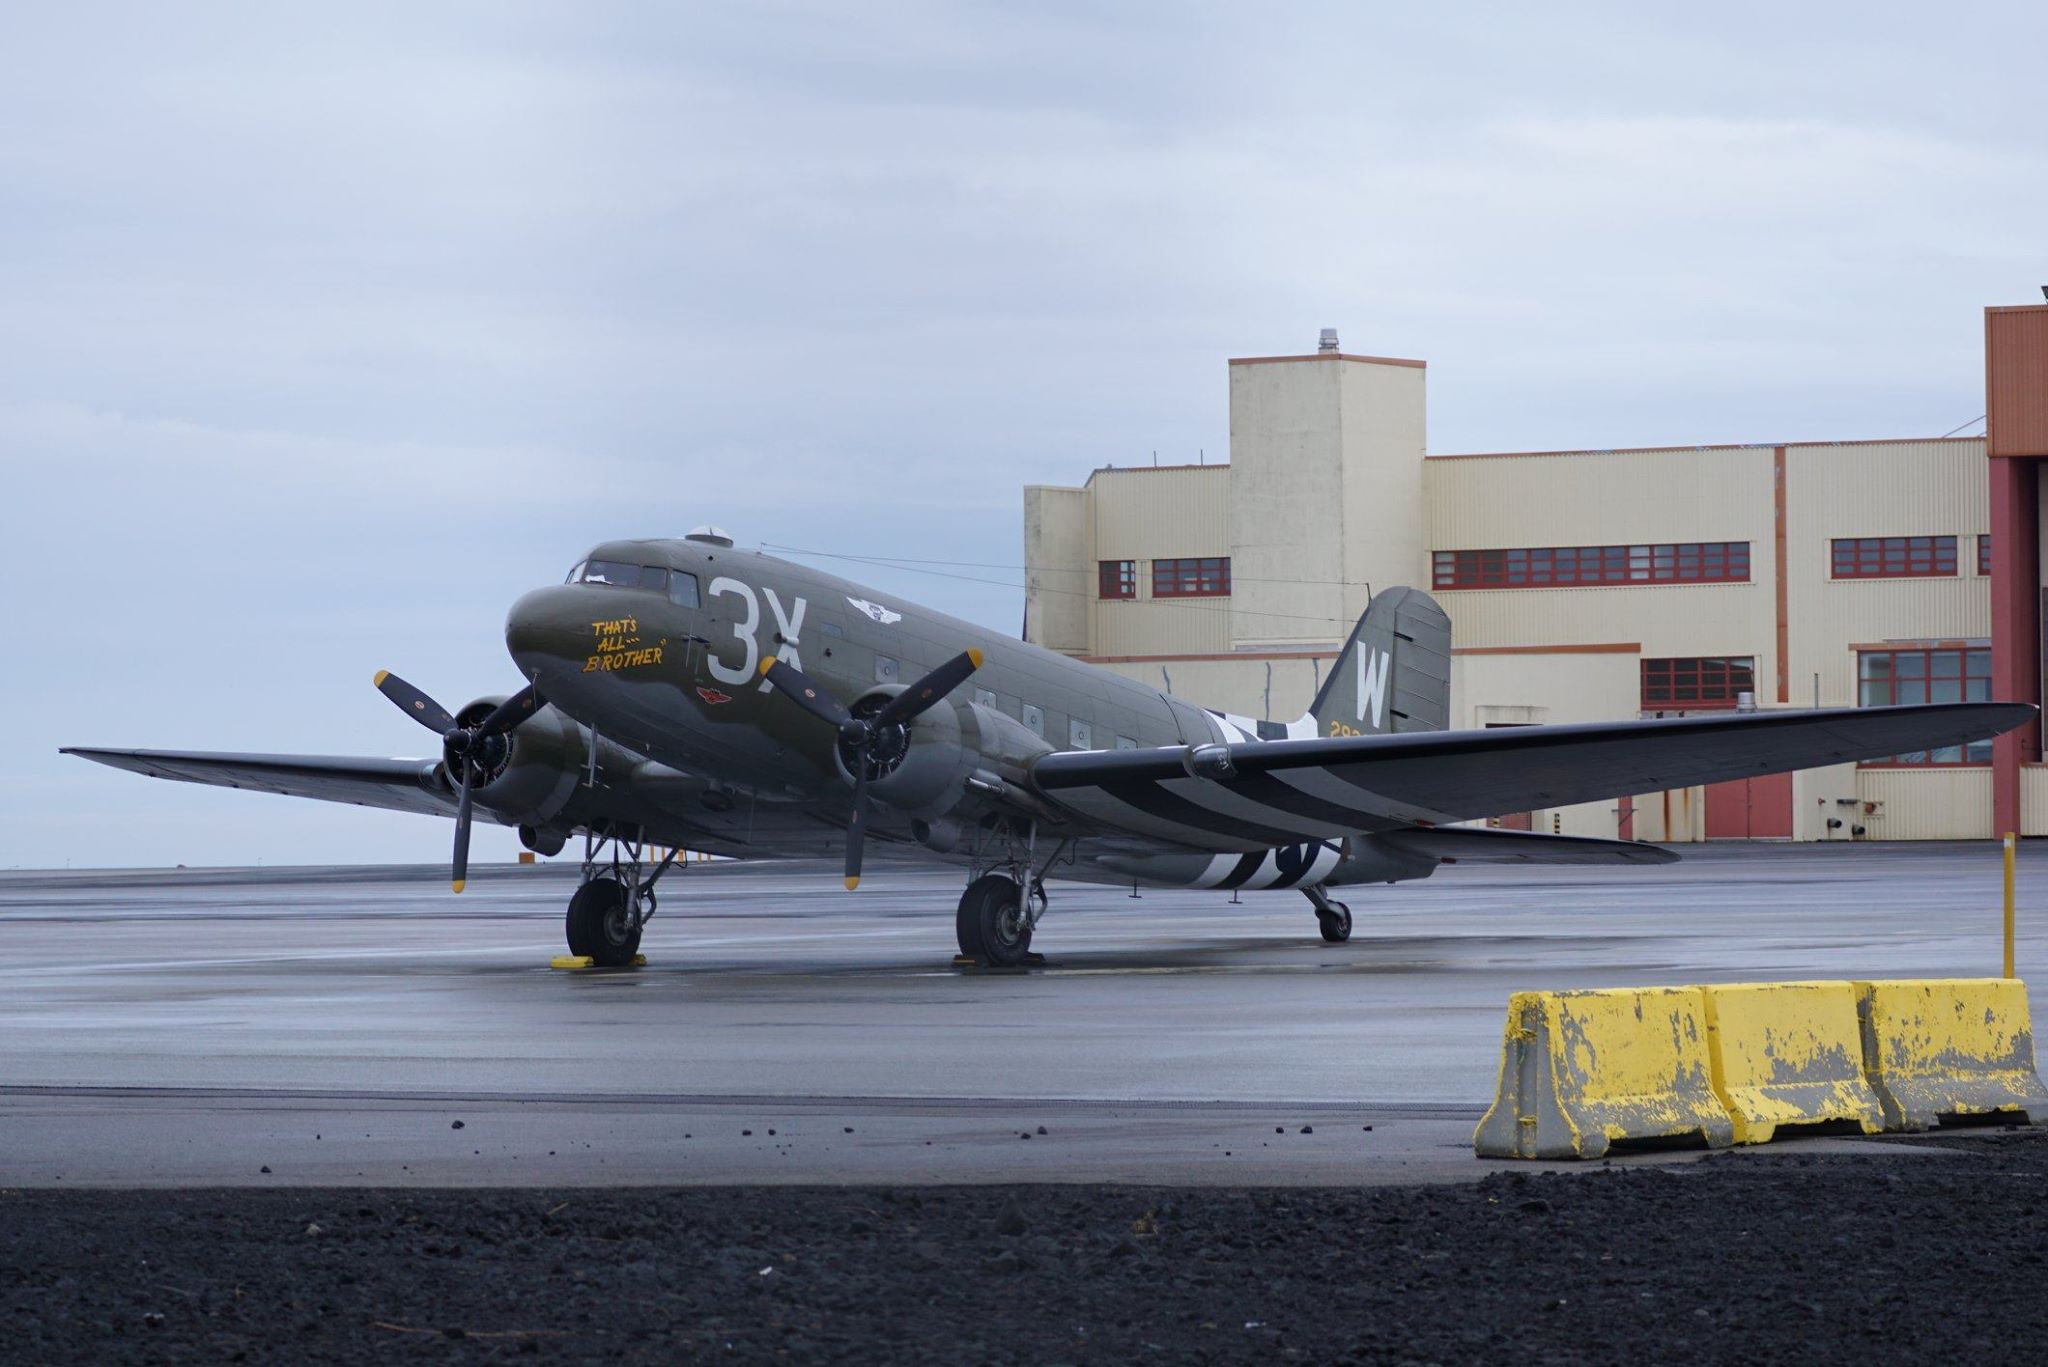 D-Day Squadron C-47 N47TB in Keflavík // Source: Markus Fürst